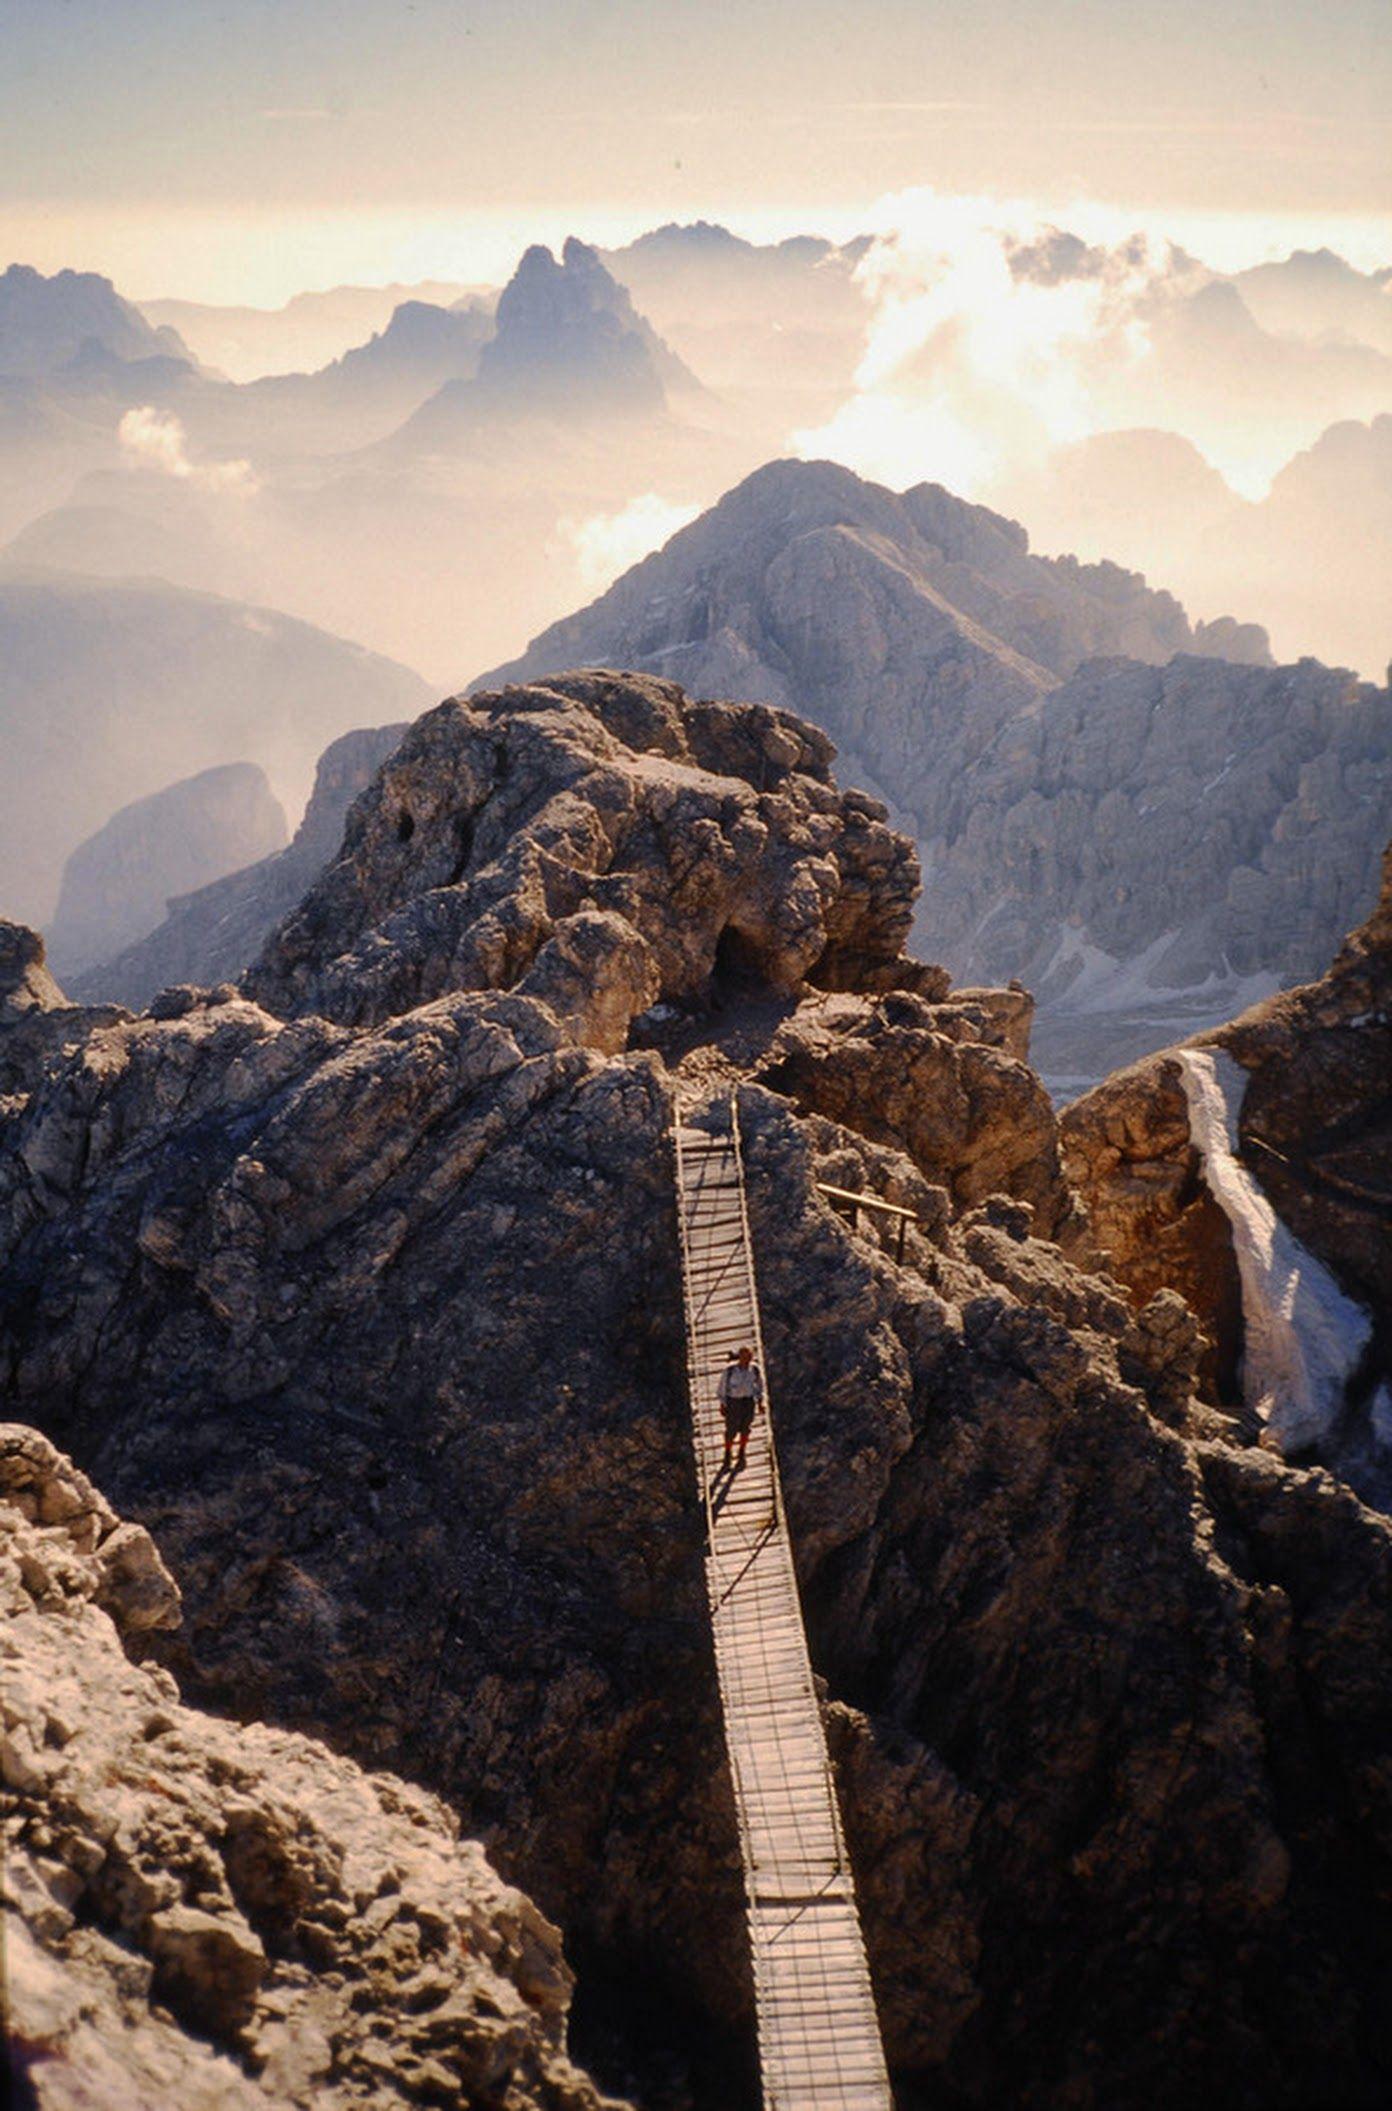 Monte Cristallo Dolomites Italy Cristina Aroni